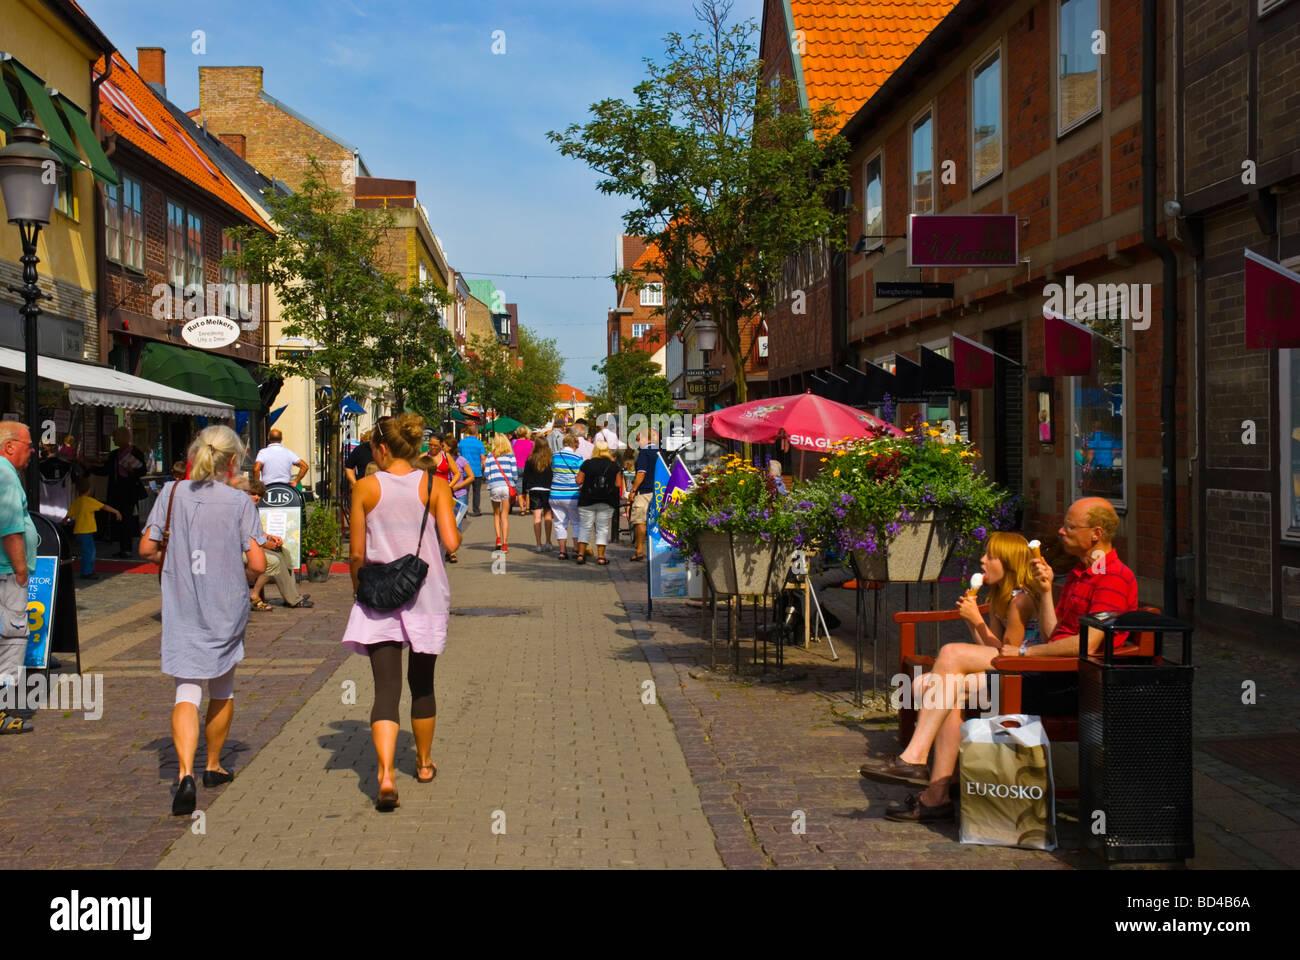 Stora Östergatan shopping street in central Ystad Skåne Sweden Europe - Stock Image